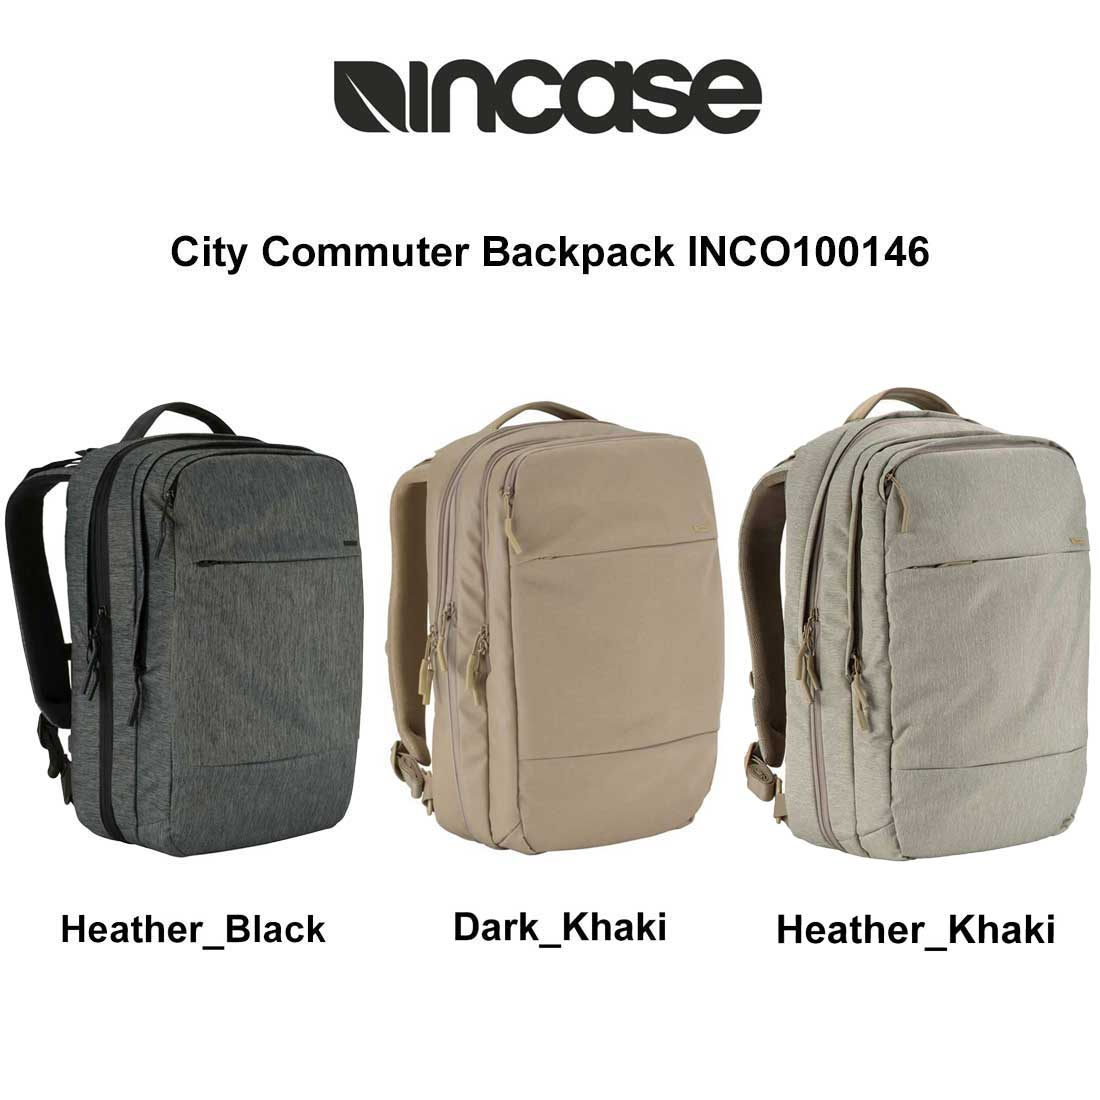 Incase(インケース)シティ バックパック リュック 通勤通学 City Commuter Backpack INCO100146